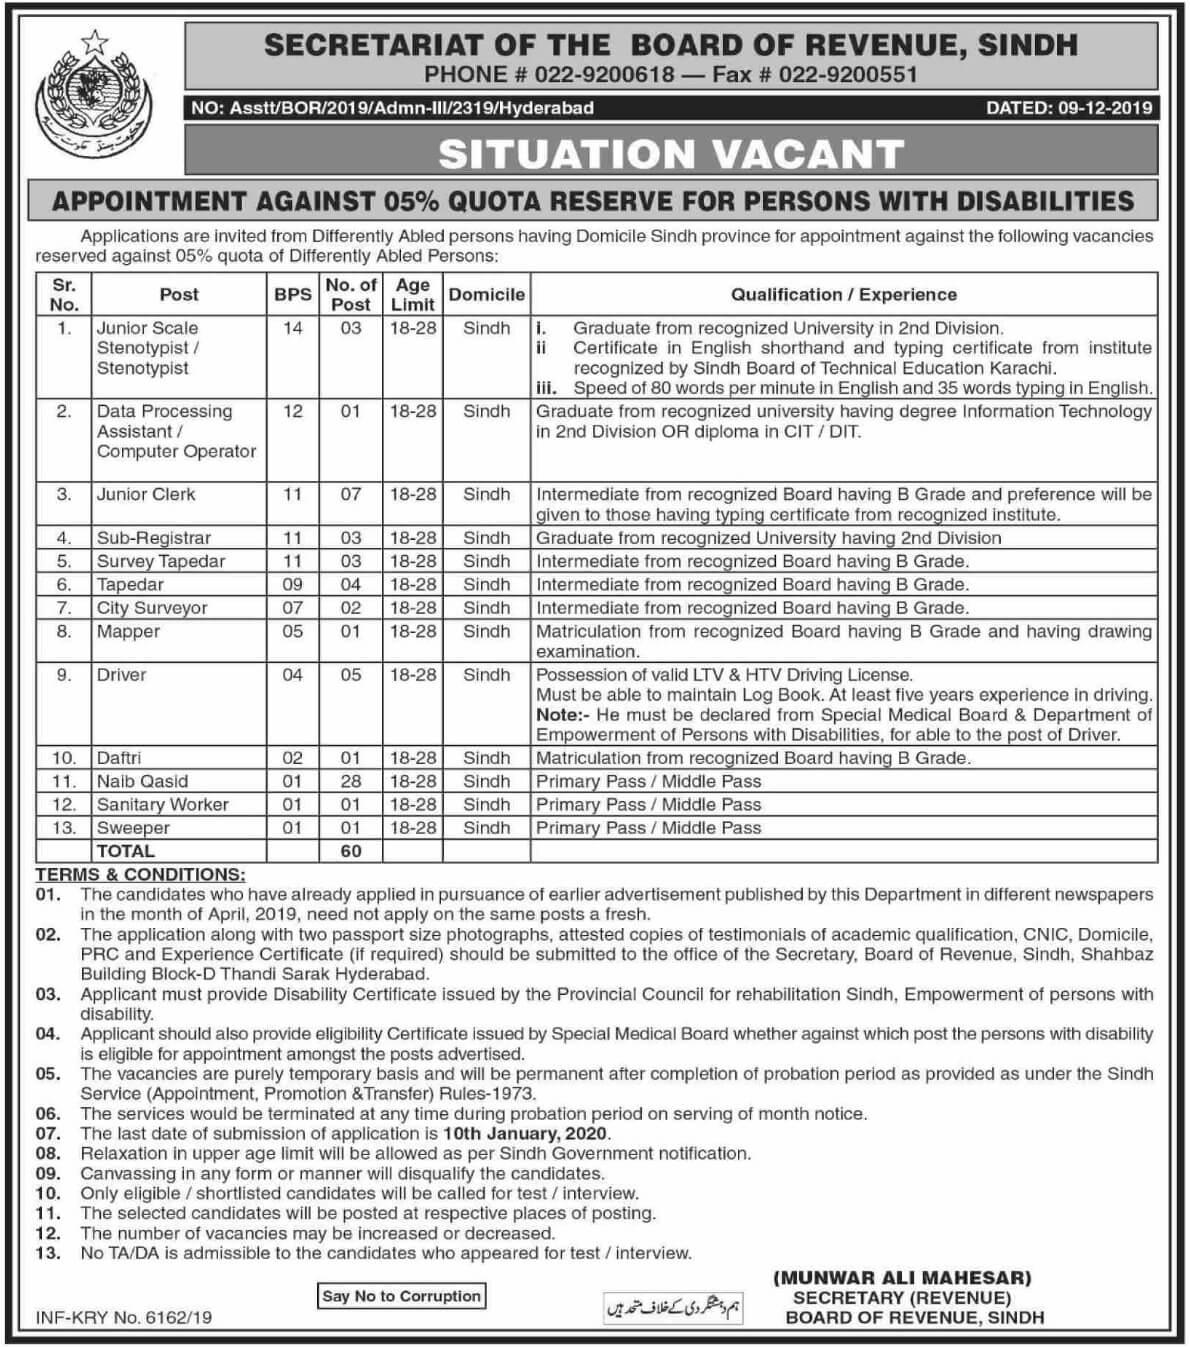 Board-of-Revenue-Sindh-Jobs-2019